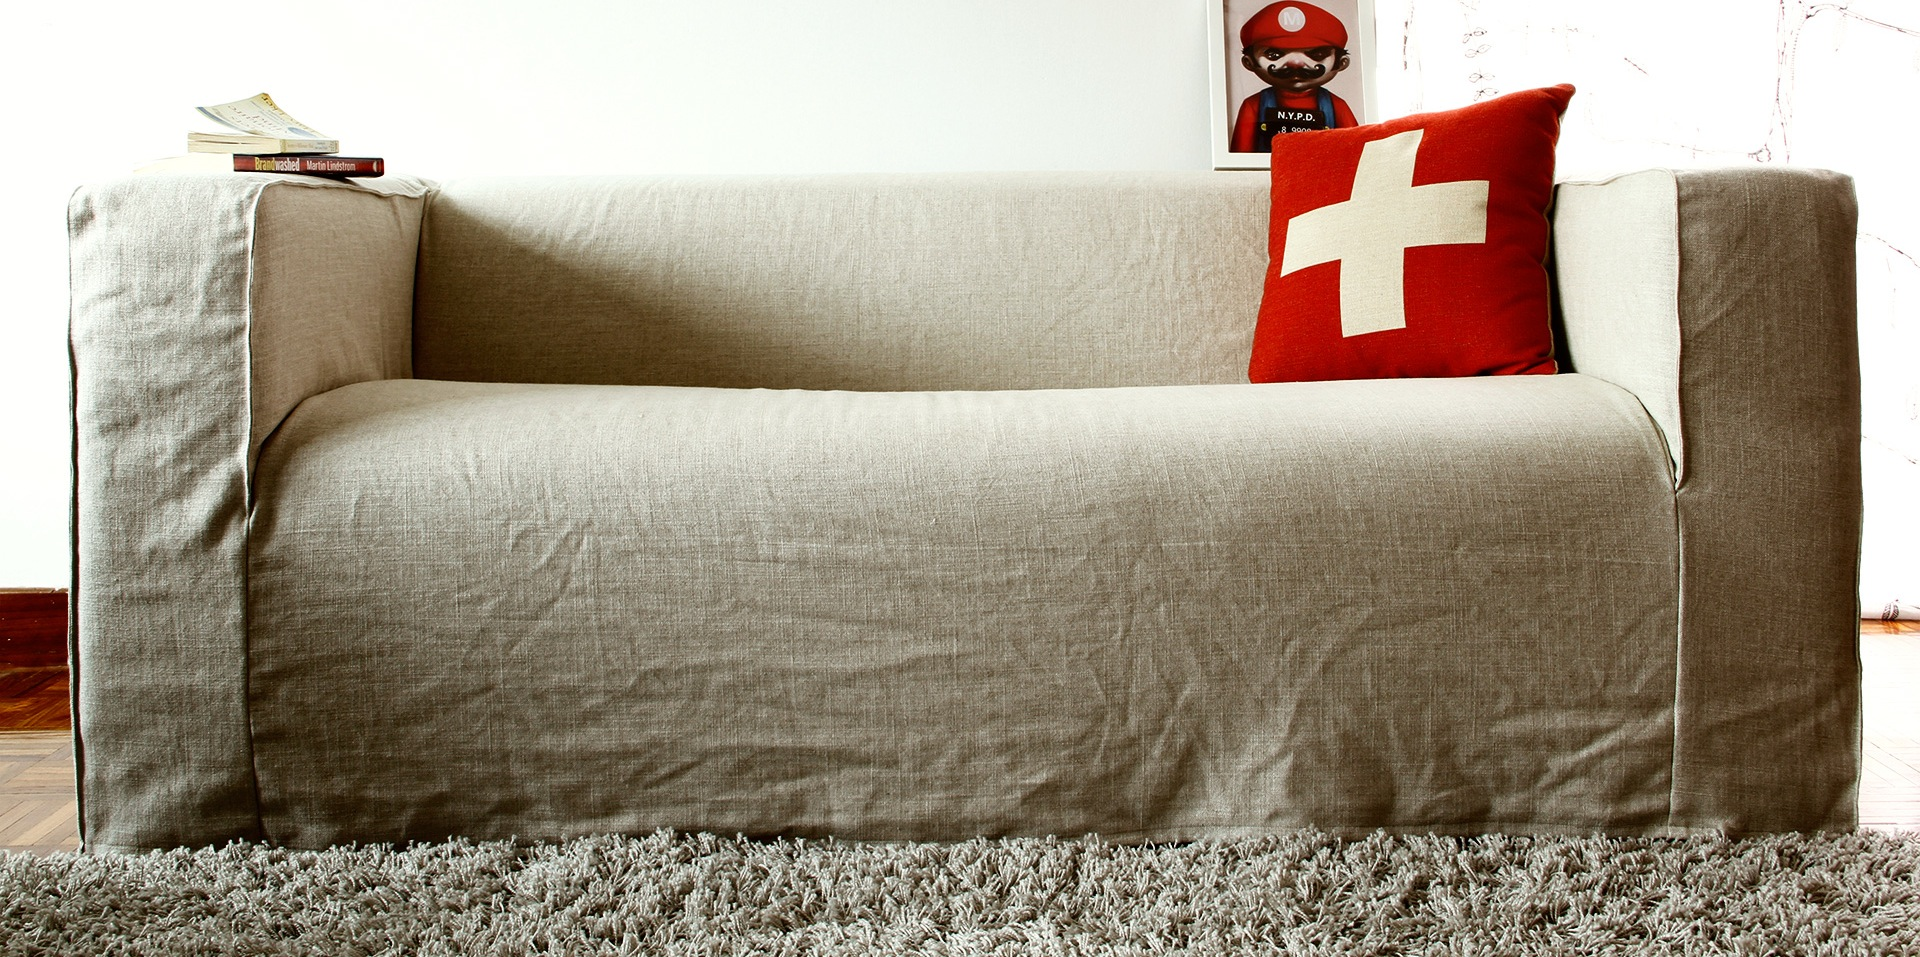 Чехол на диван из льна